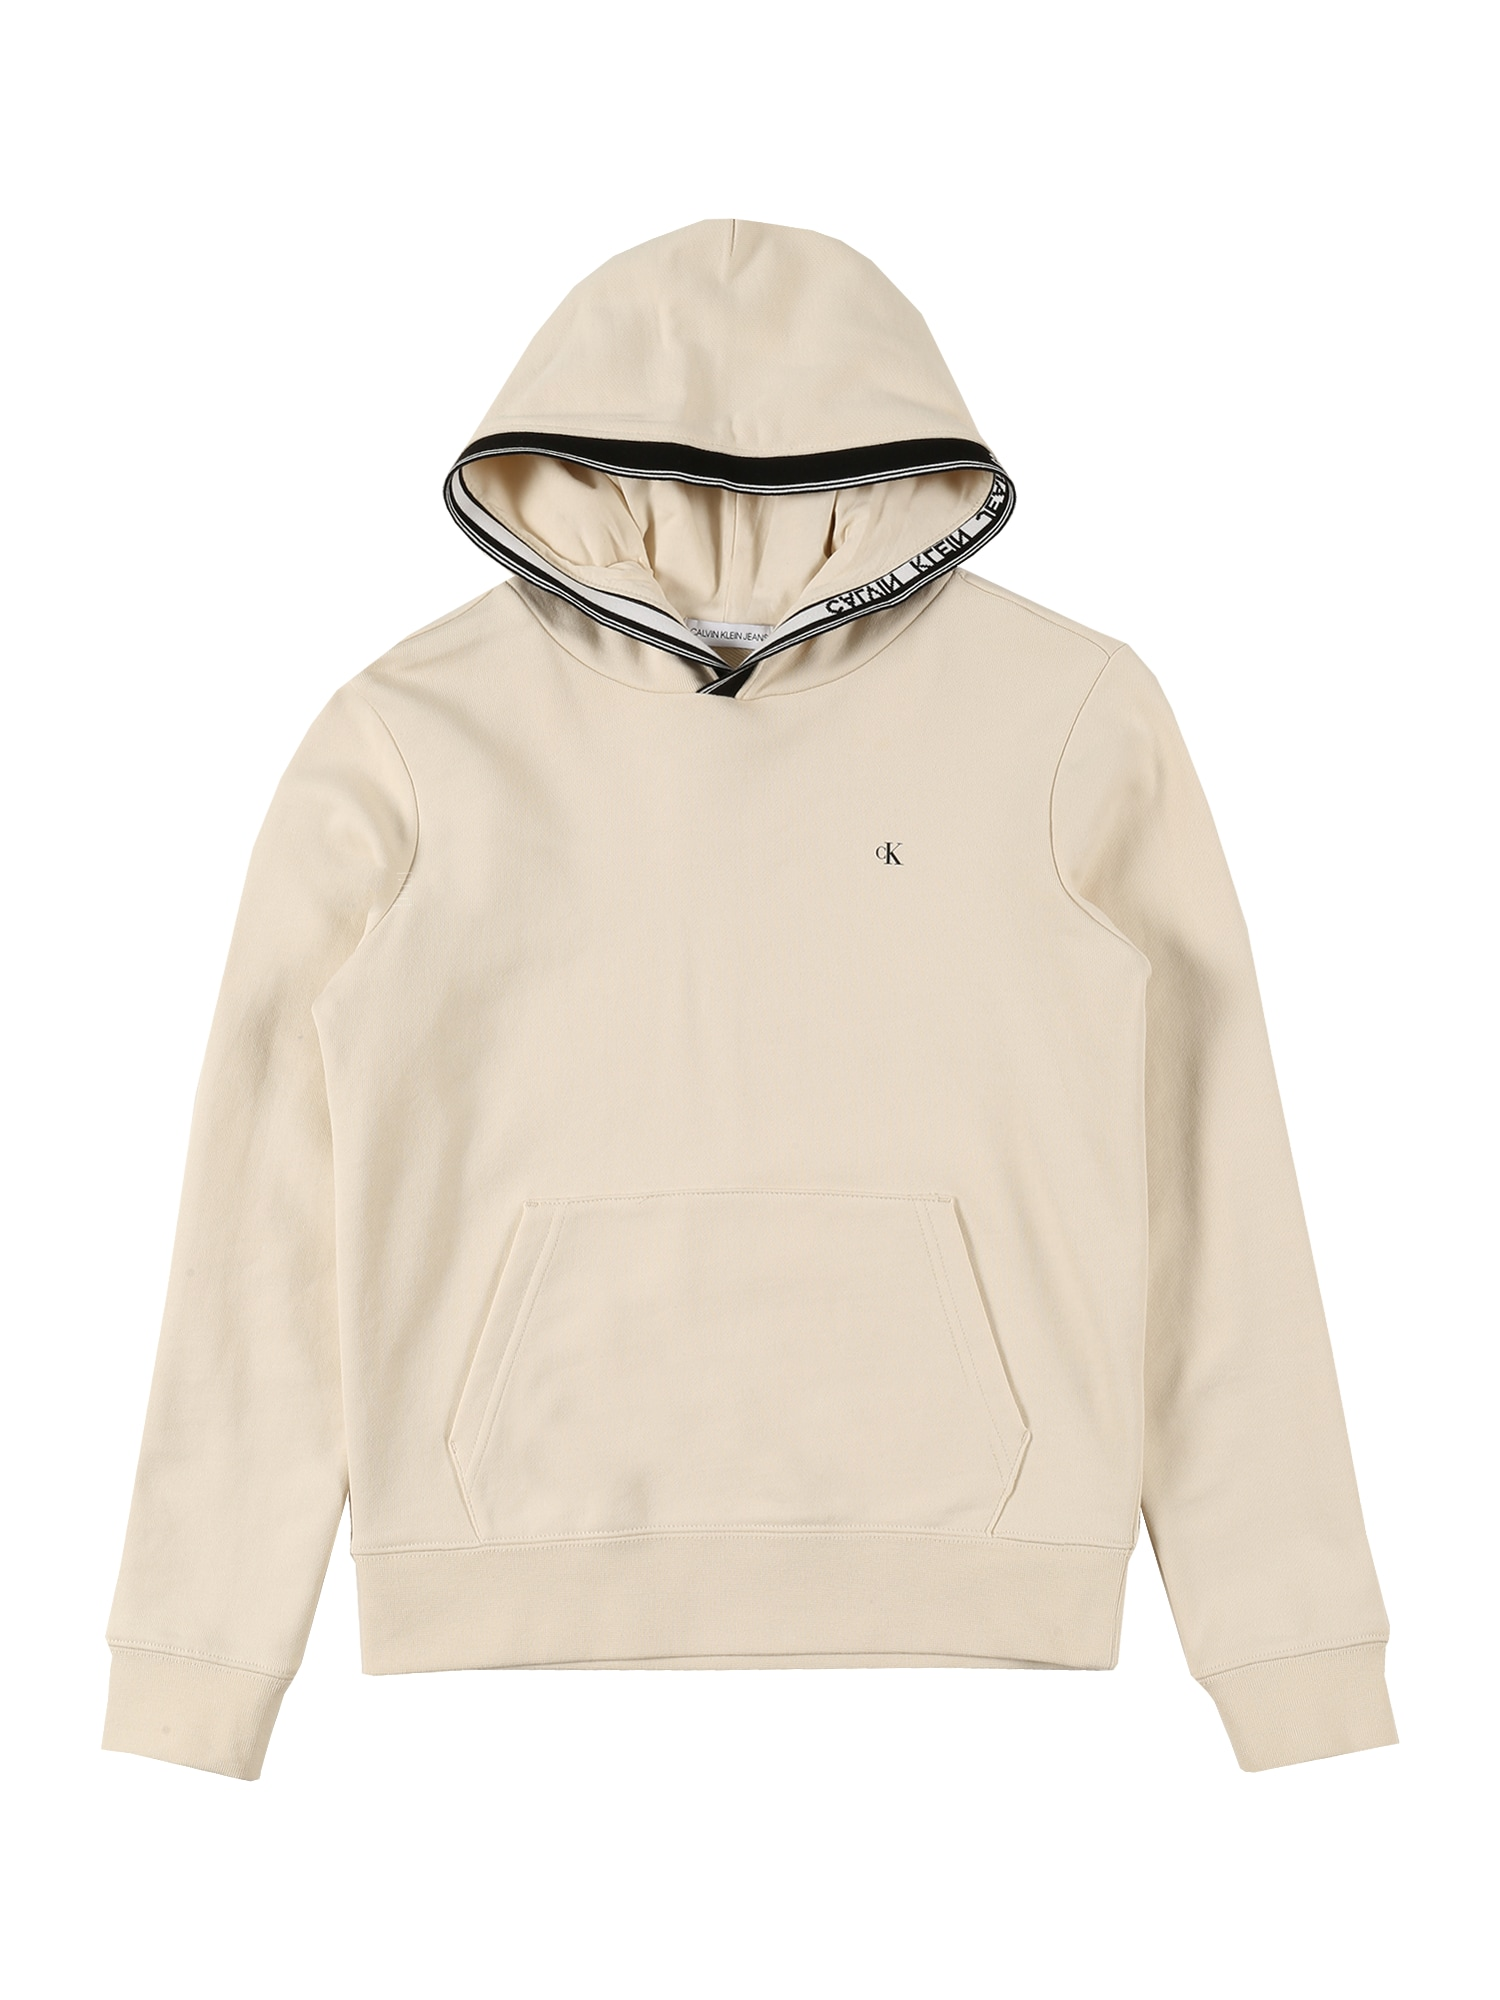 Calvin Klein Jeans Megztinis be užsegimo gelsvai pilka spalva